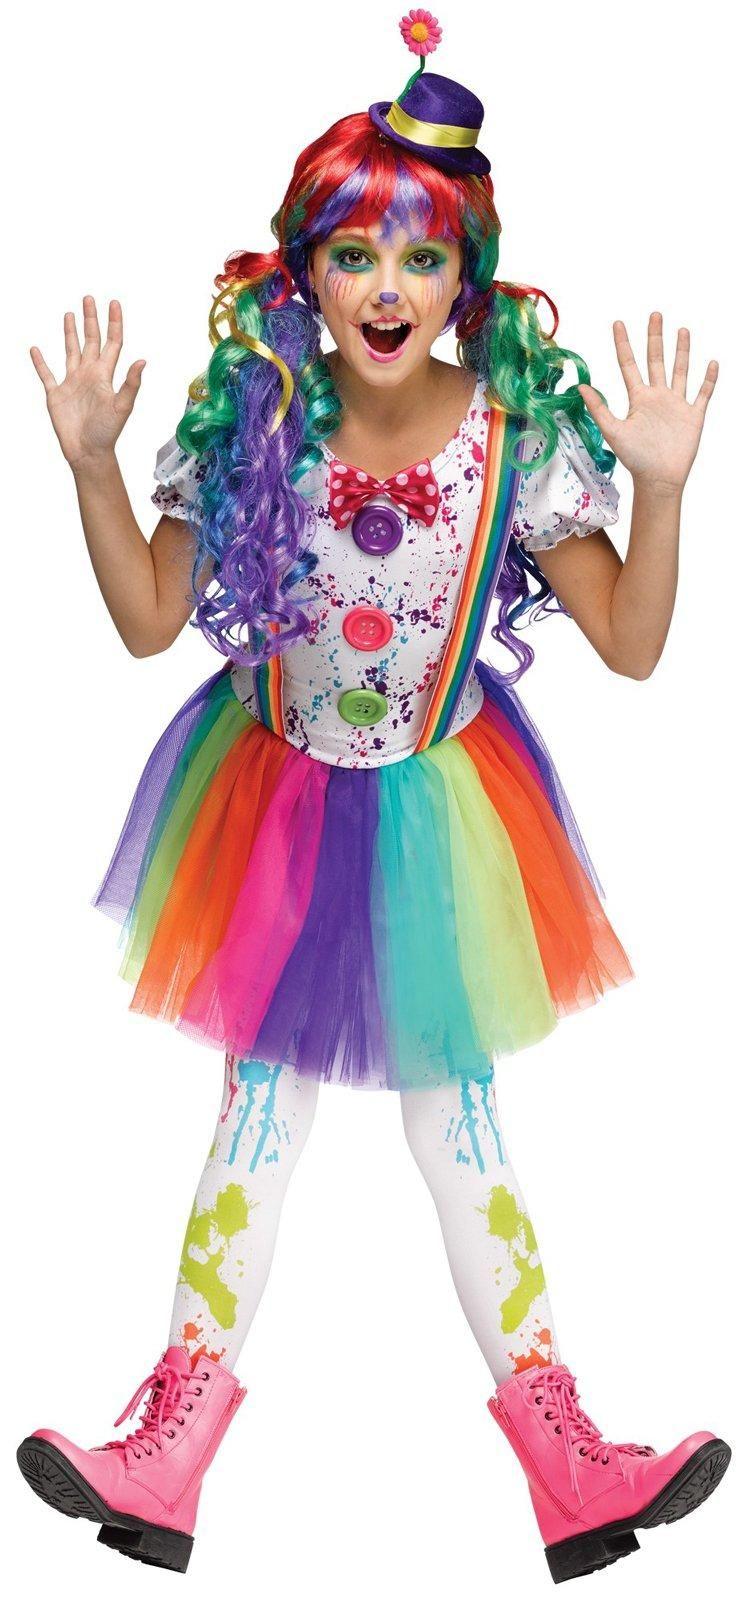 Kids Crazy Color Clown Costume Costumes, Halloween